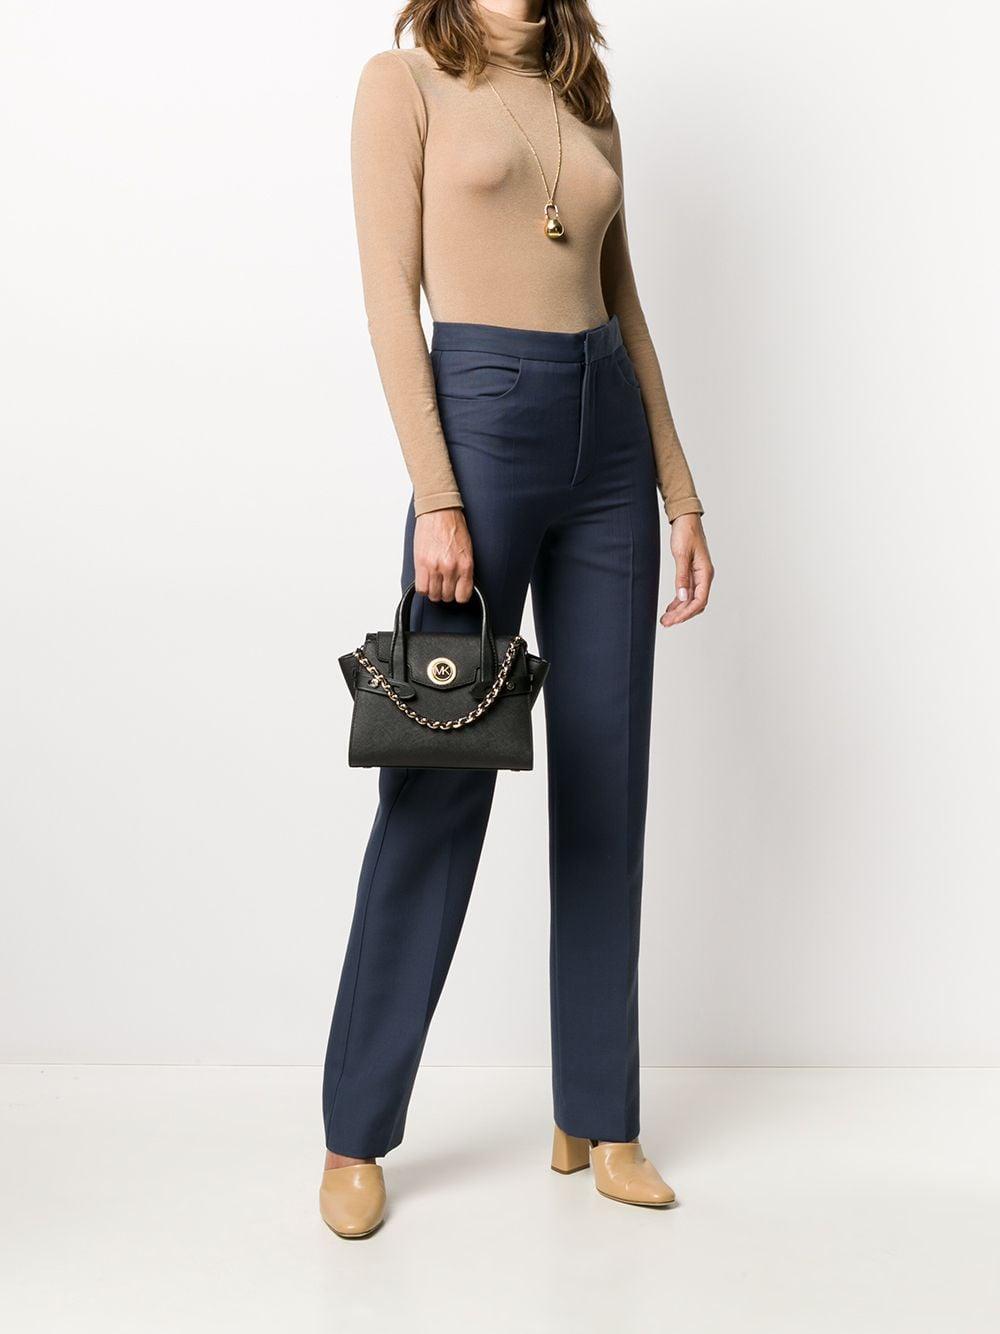 Carmen Small Leather Bag